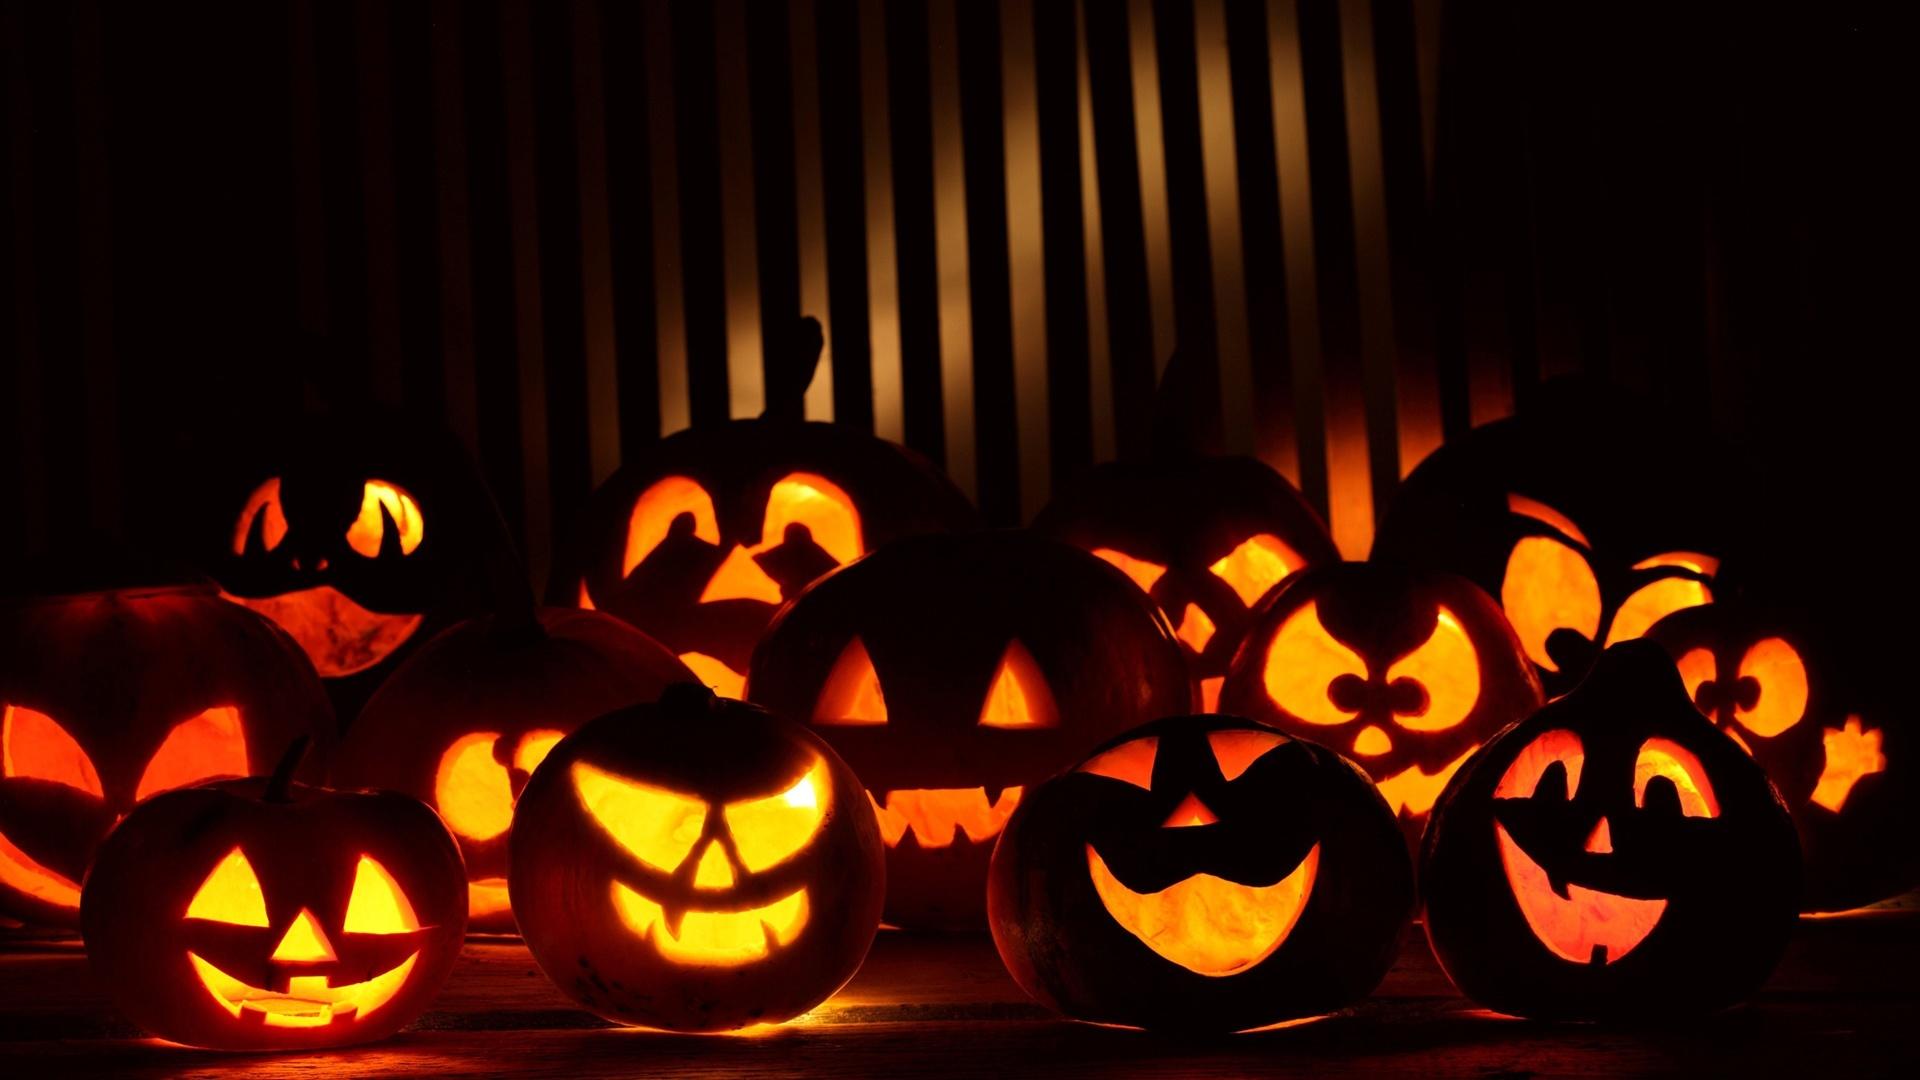 Halloween Pumpkin Desktop wallpaper